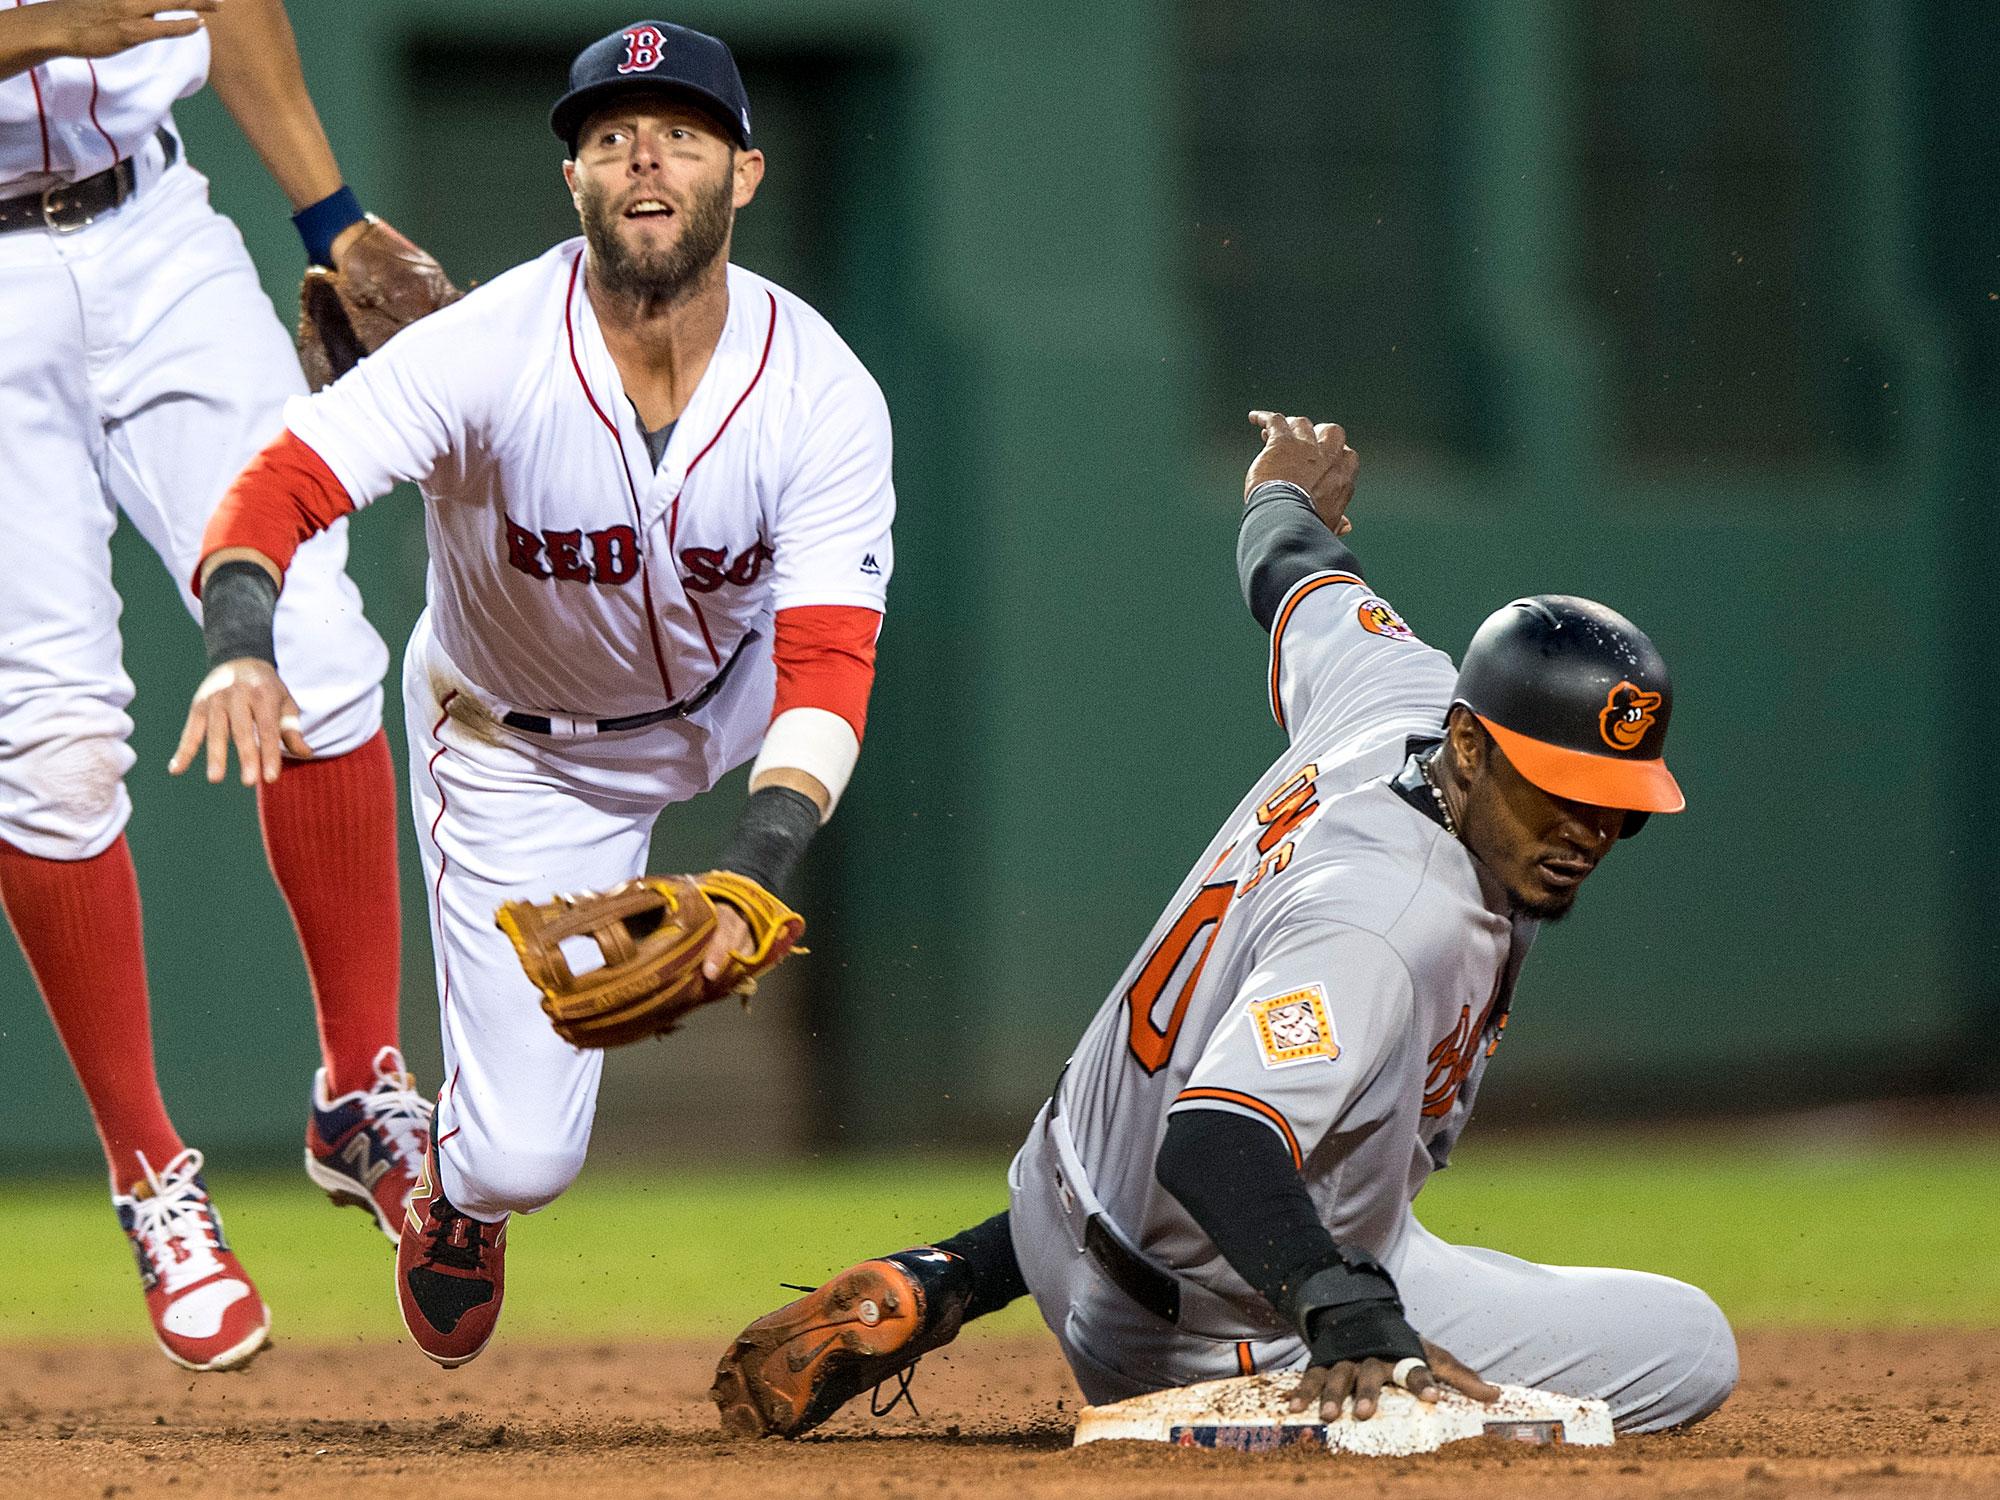 Dustin Pedroia, Boston Red Sox; Adam Jones, Baltimore Orioles